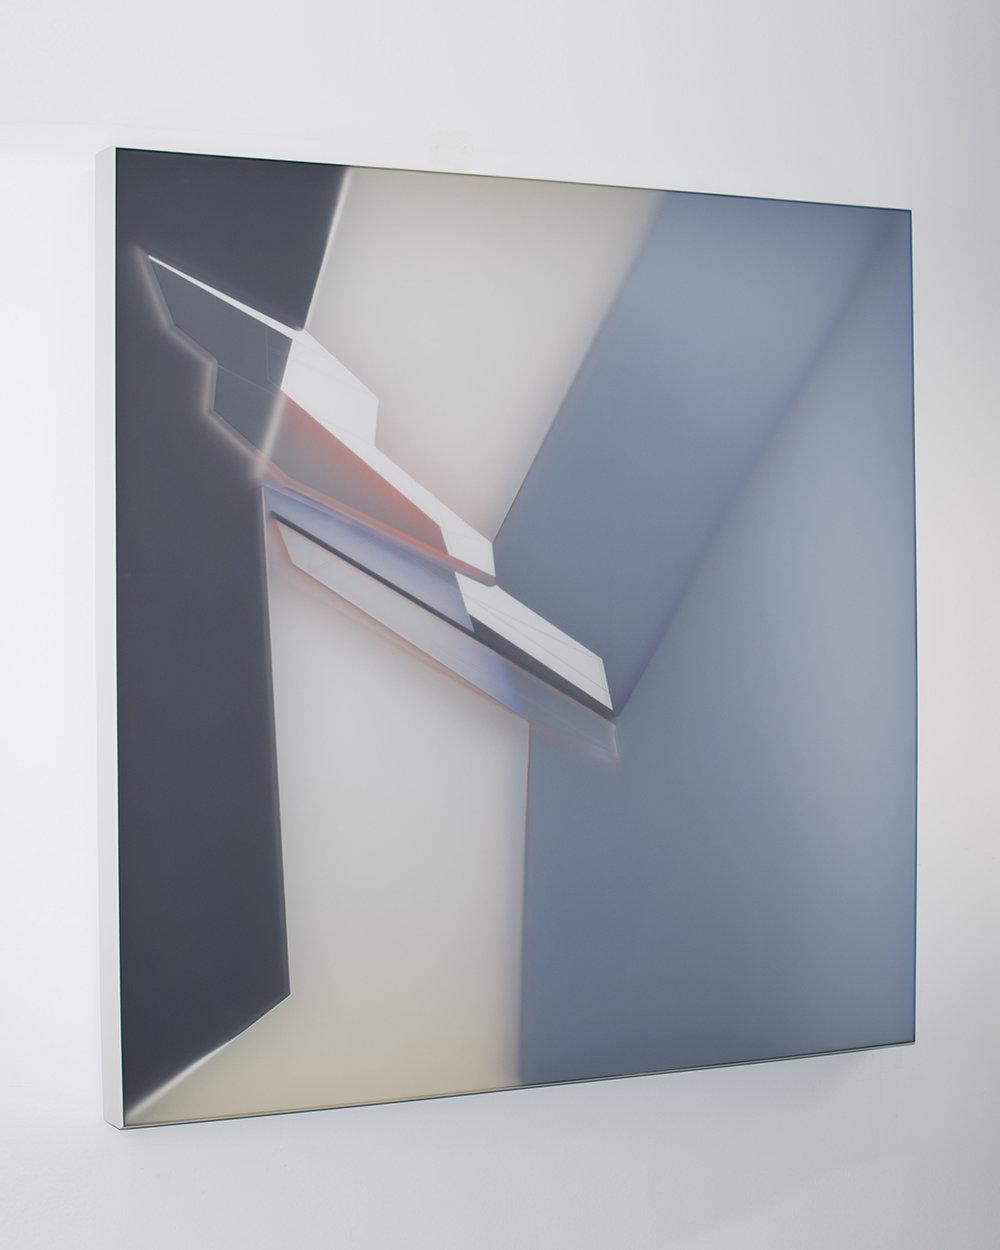 Gray Fracture 3-40x40.jpg